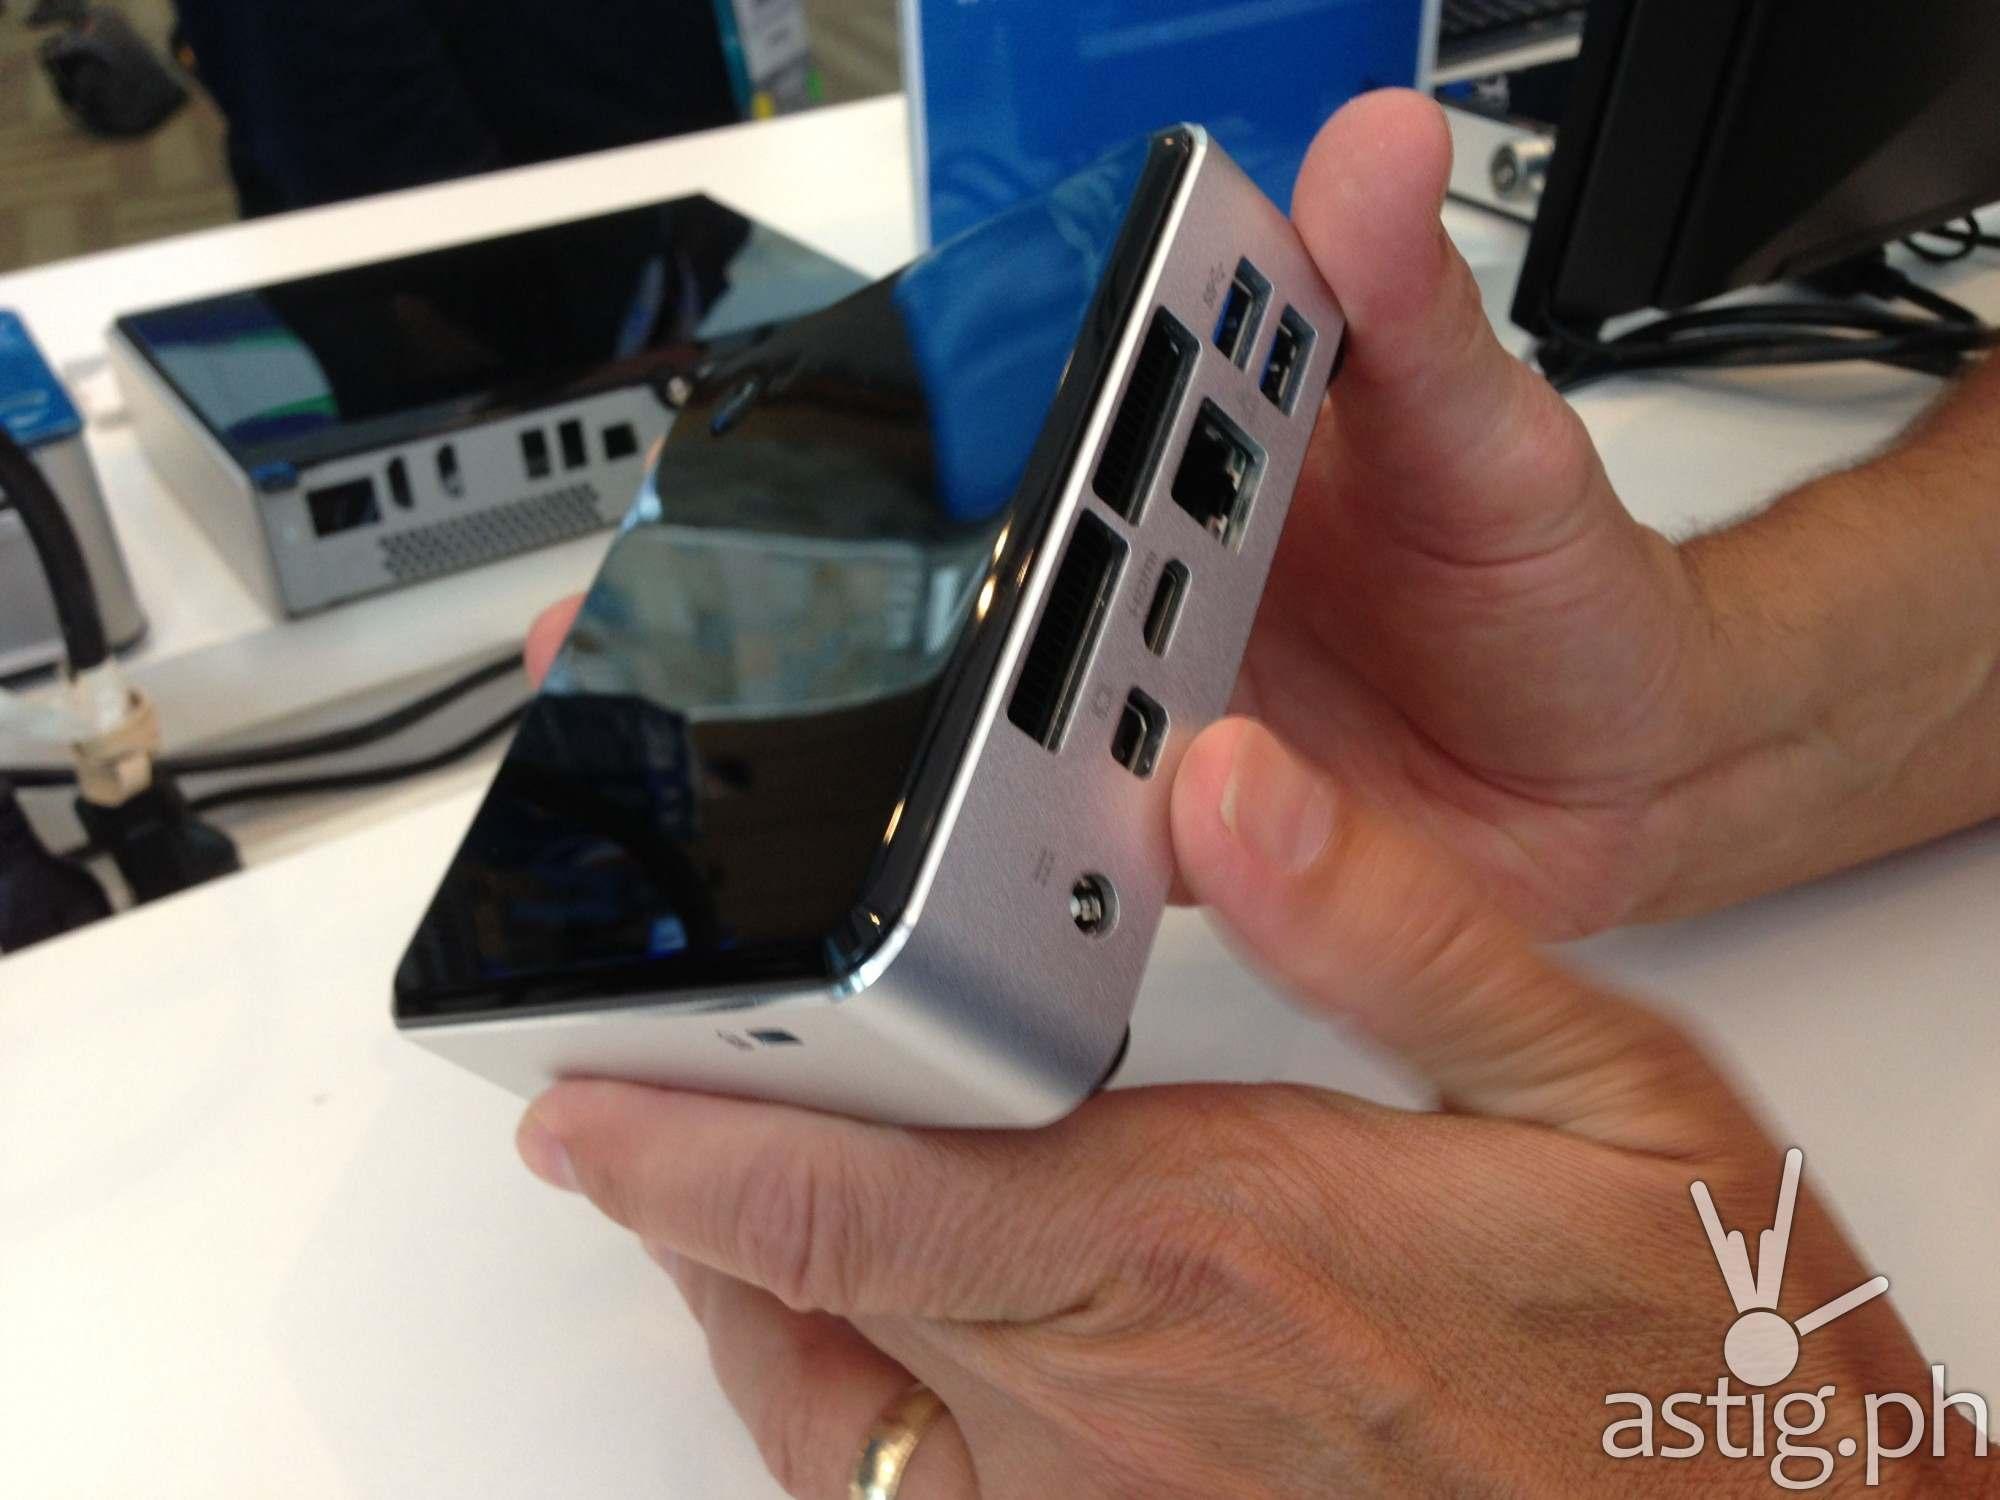 Intel NUC Haswell (case rear panel)